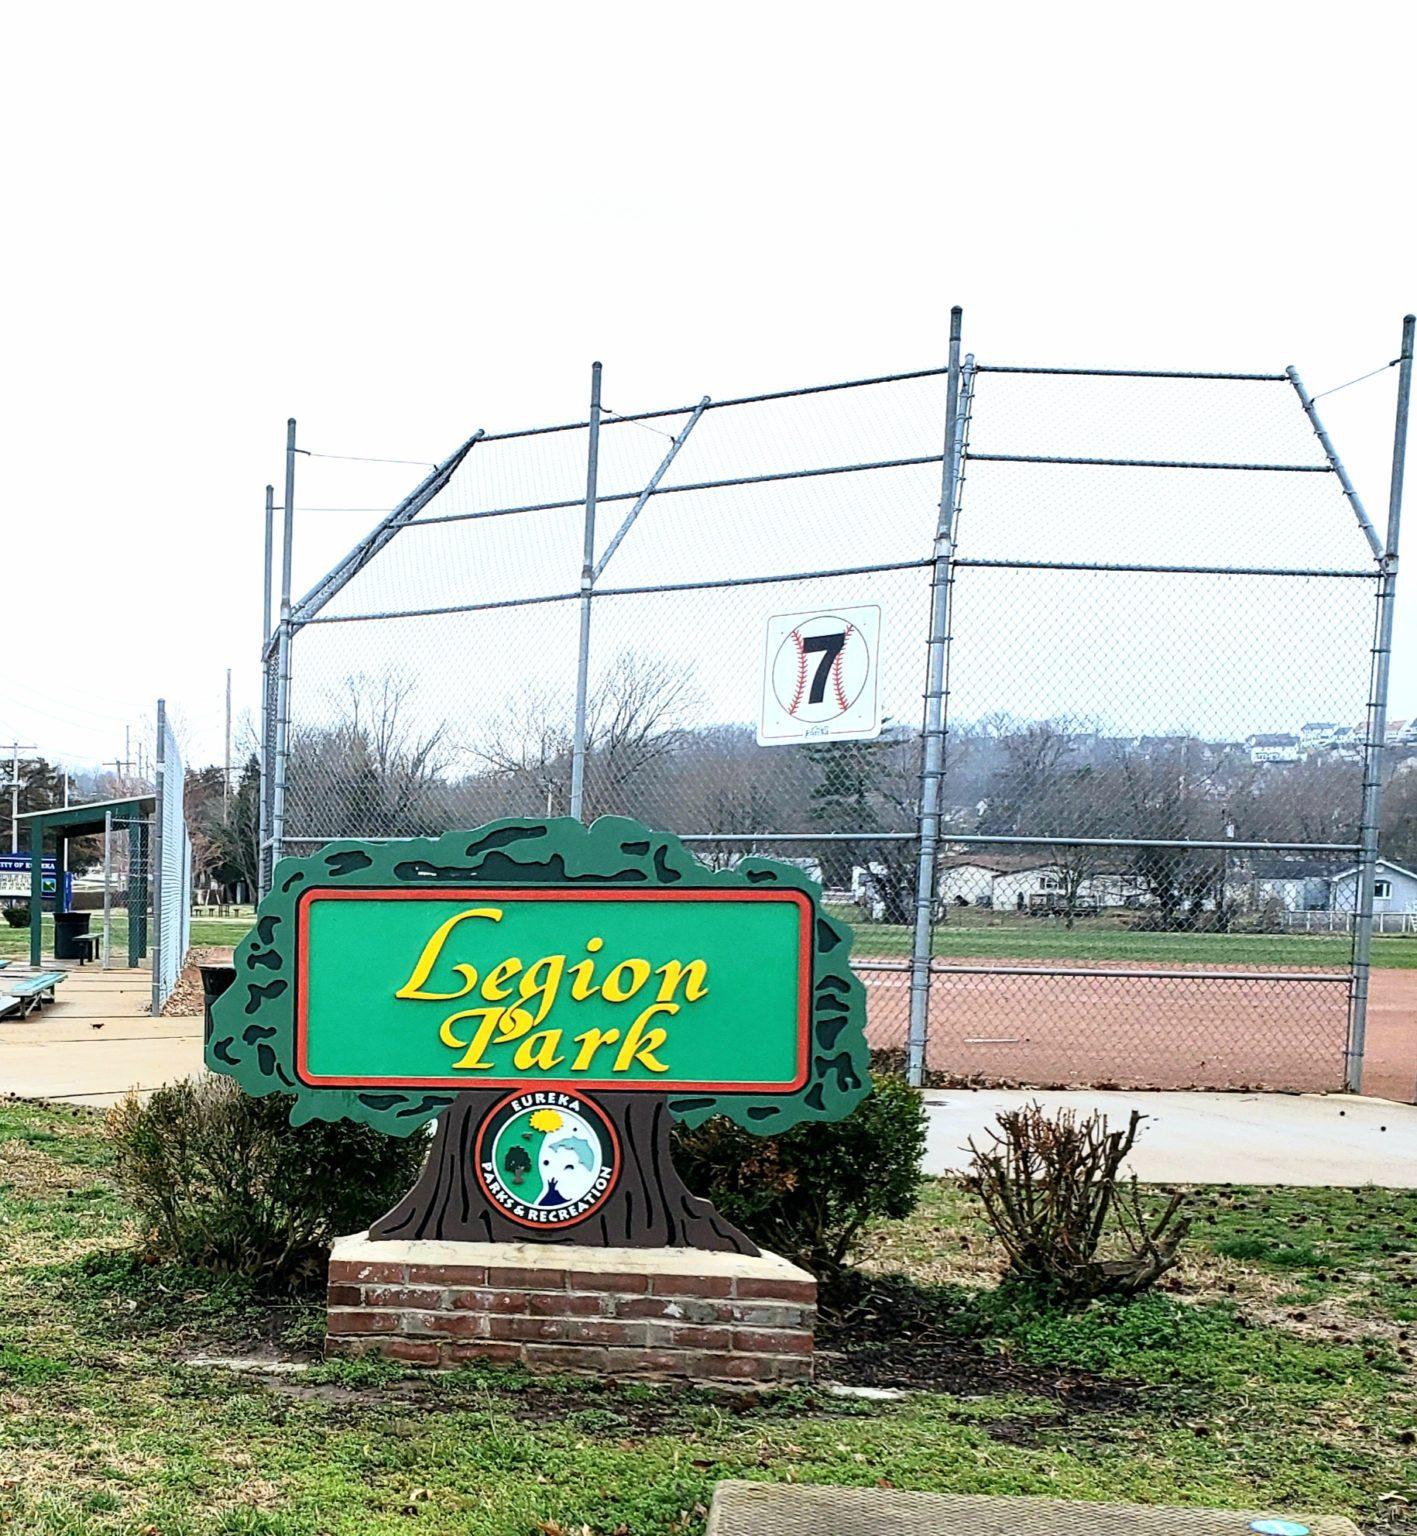 Baseball backstop behind a green Legion Park sign in Eureka